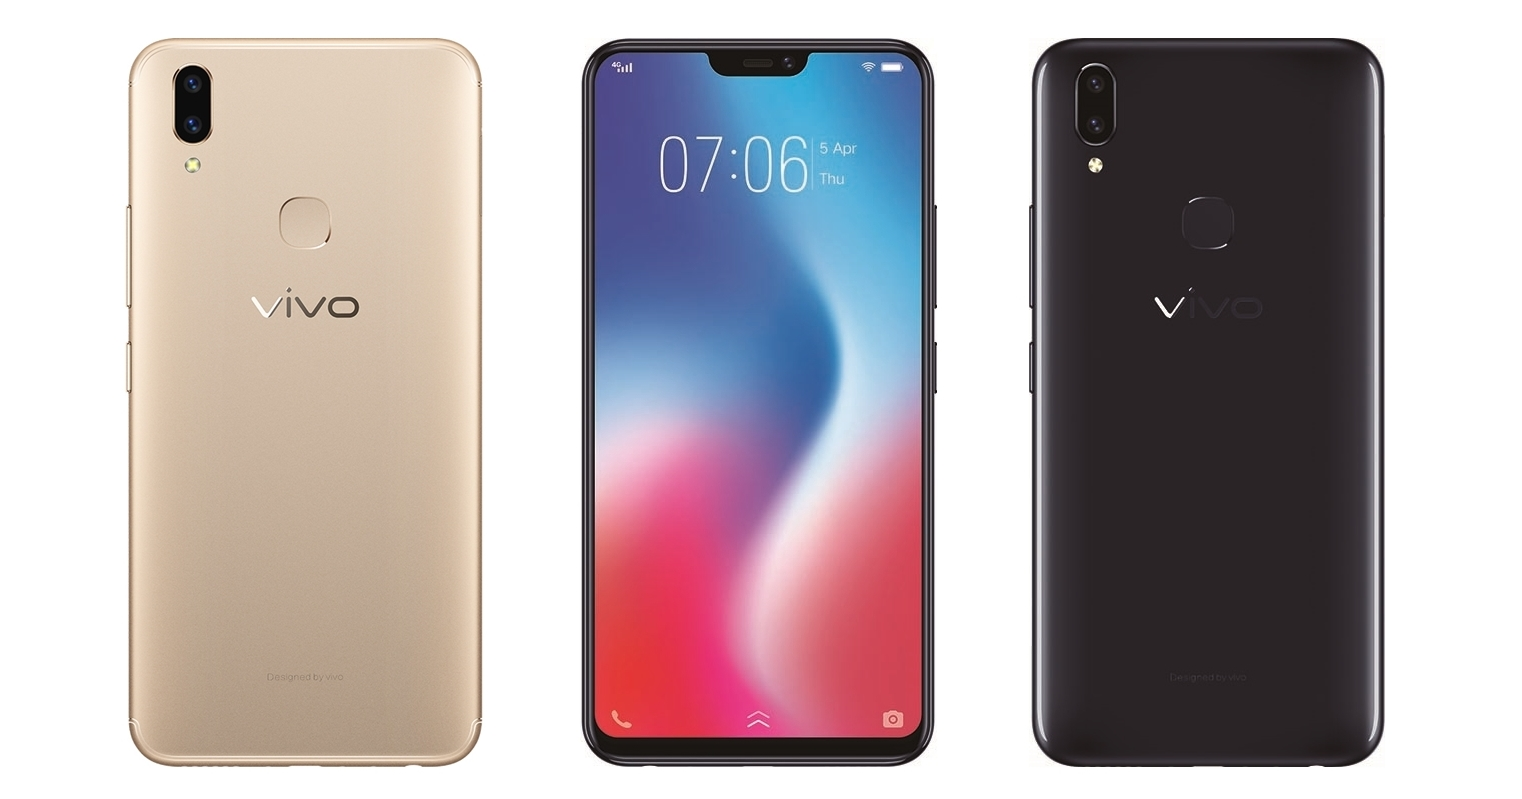 Vivo 大螢幕手機再添一款,6.3 吋 V9 即日起開賣